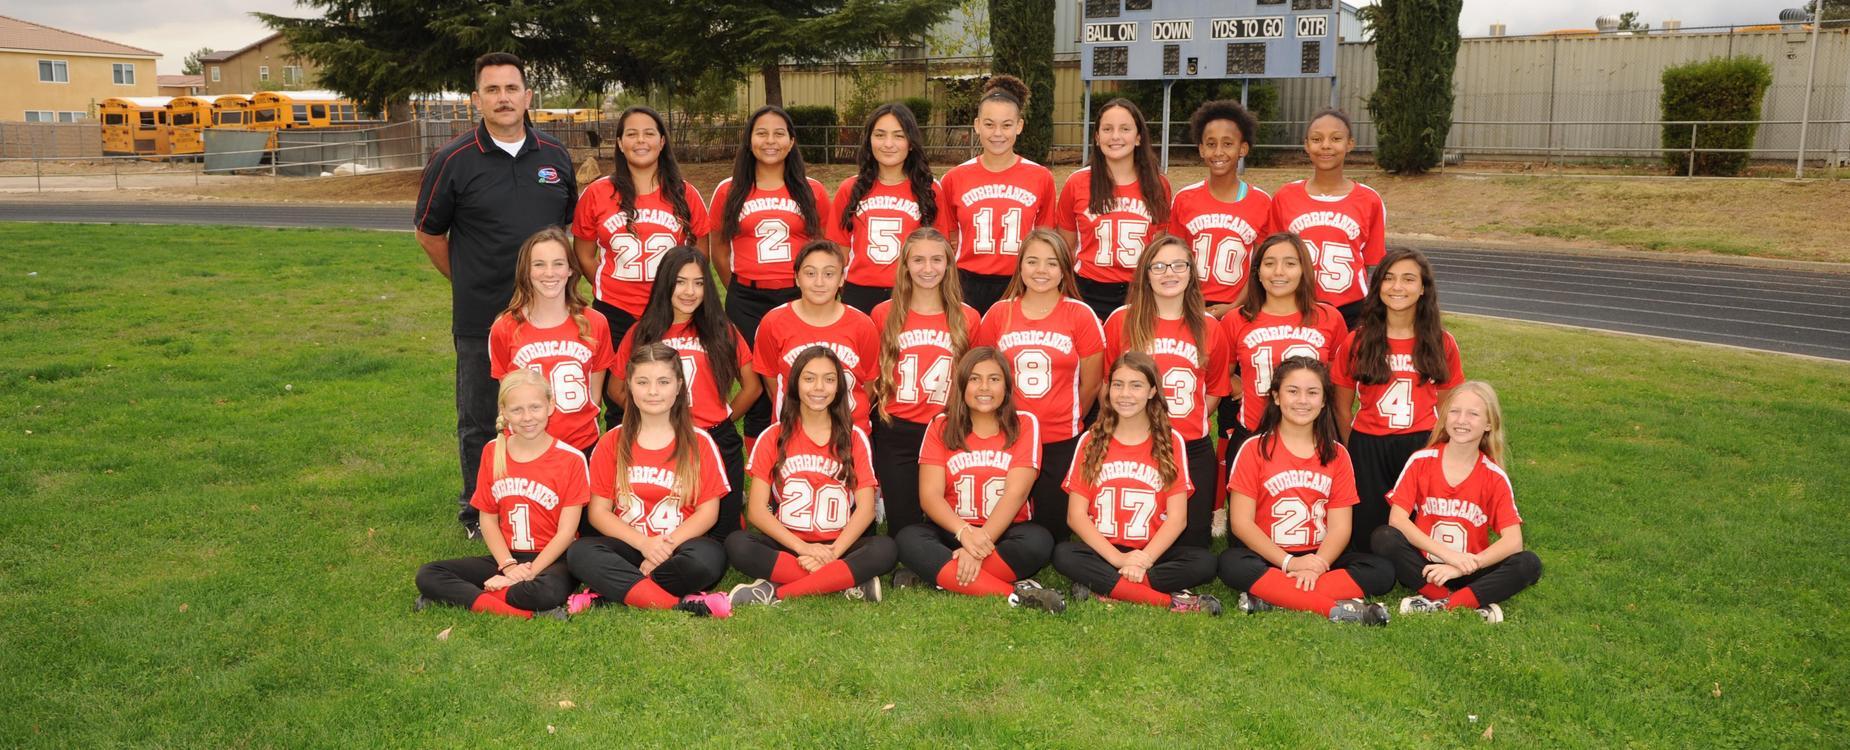 SGMS Girls Softball Team